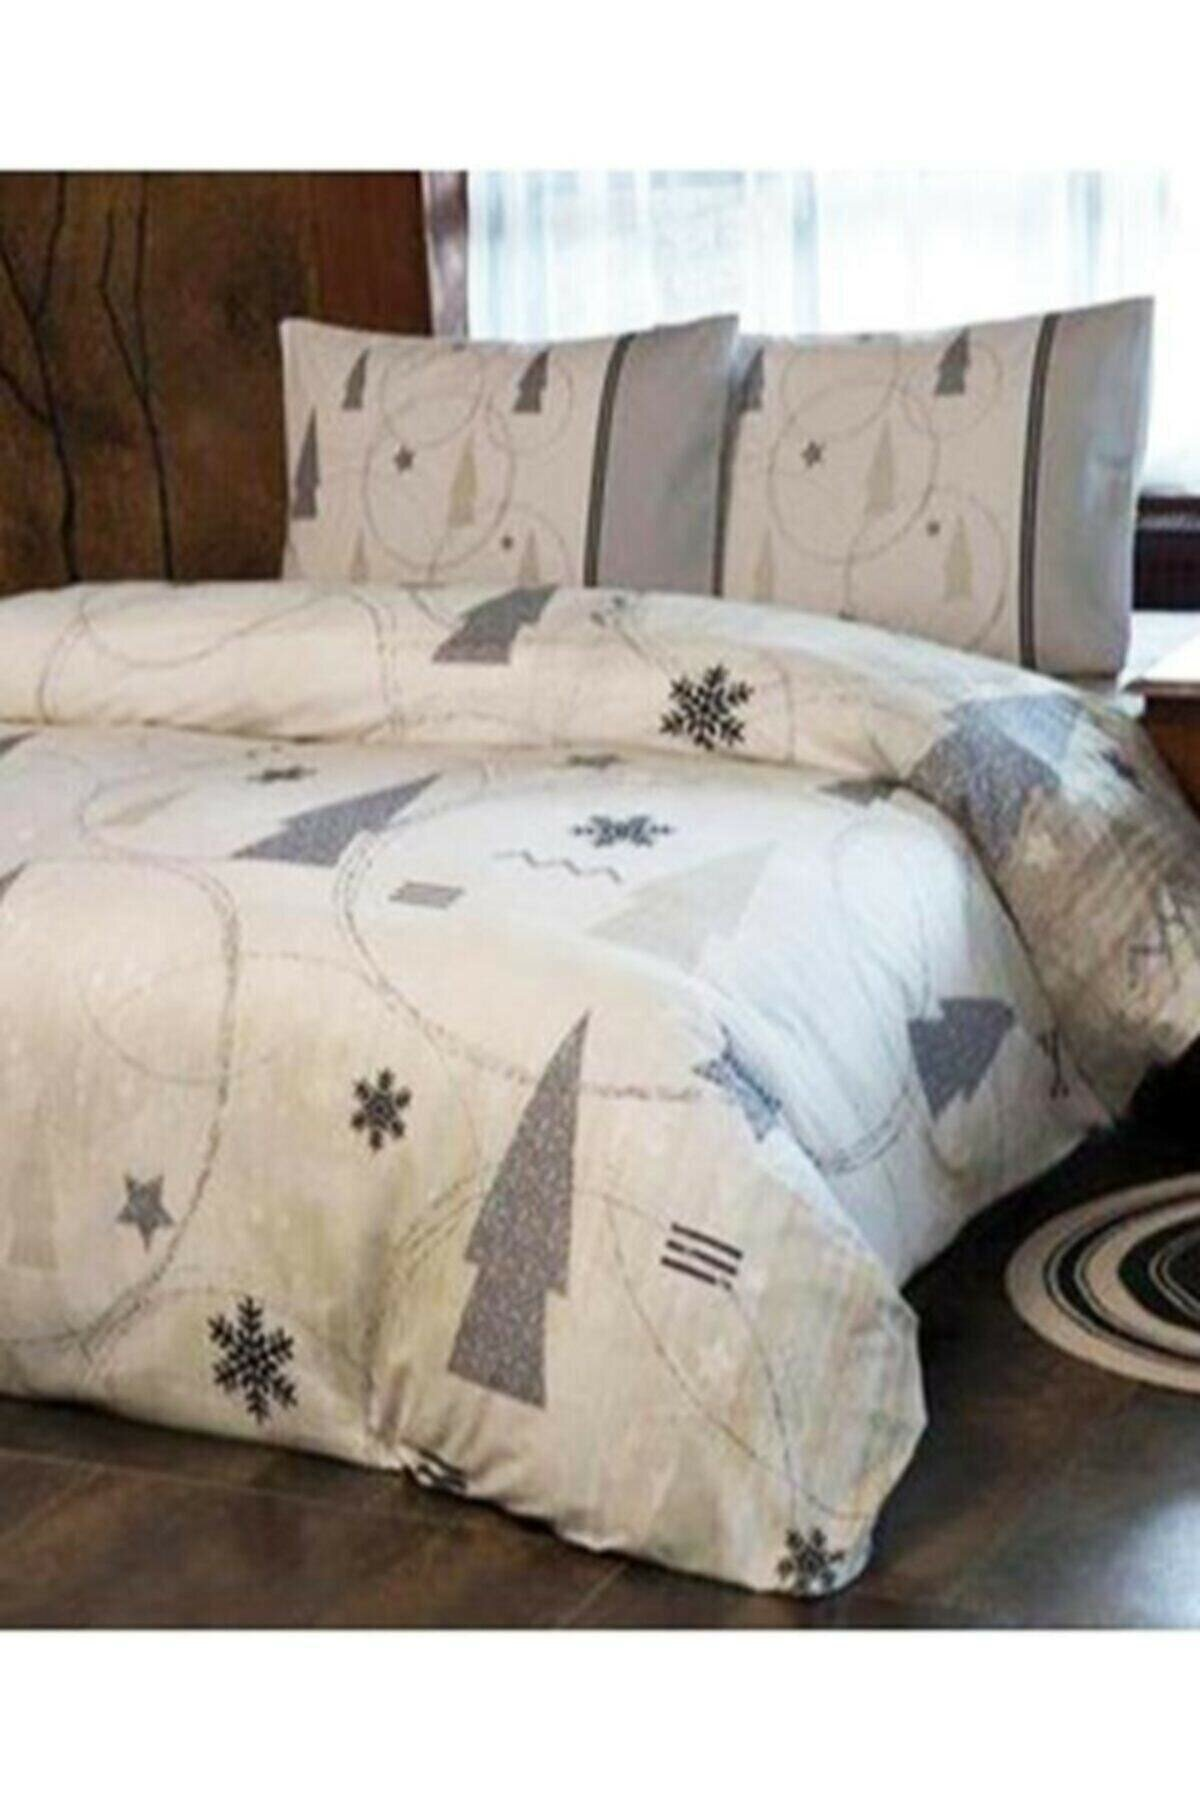 Özdilek شتوي Joy مزدوج مجموعة غطاء لحاف شتوي, بدون مرونة, 200x220 سم, قطن, لون بيج, 100% صنع في تركيا